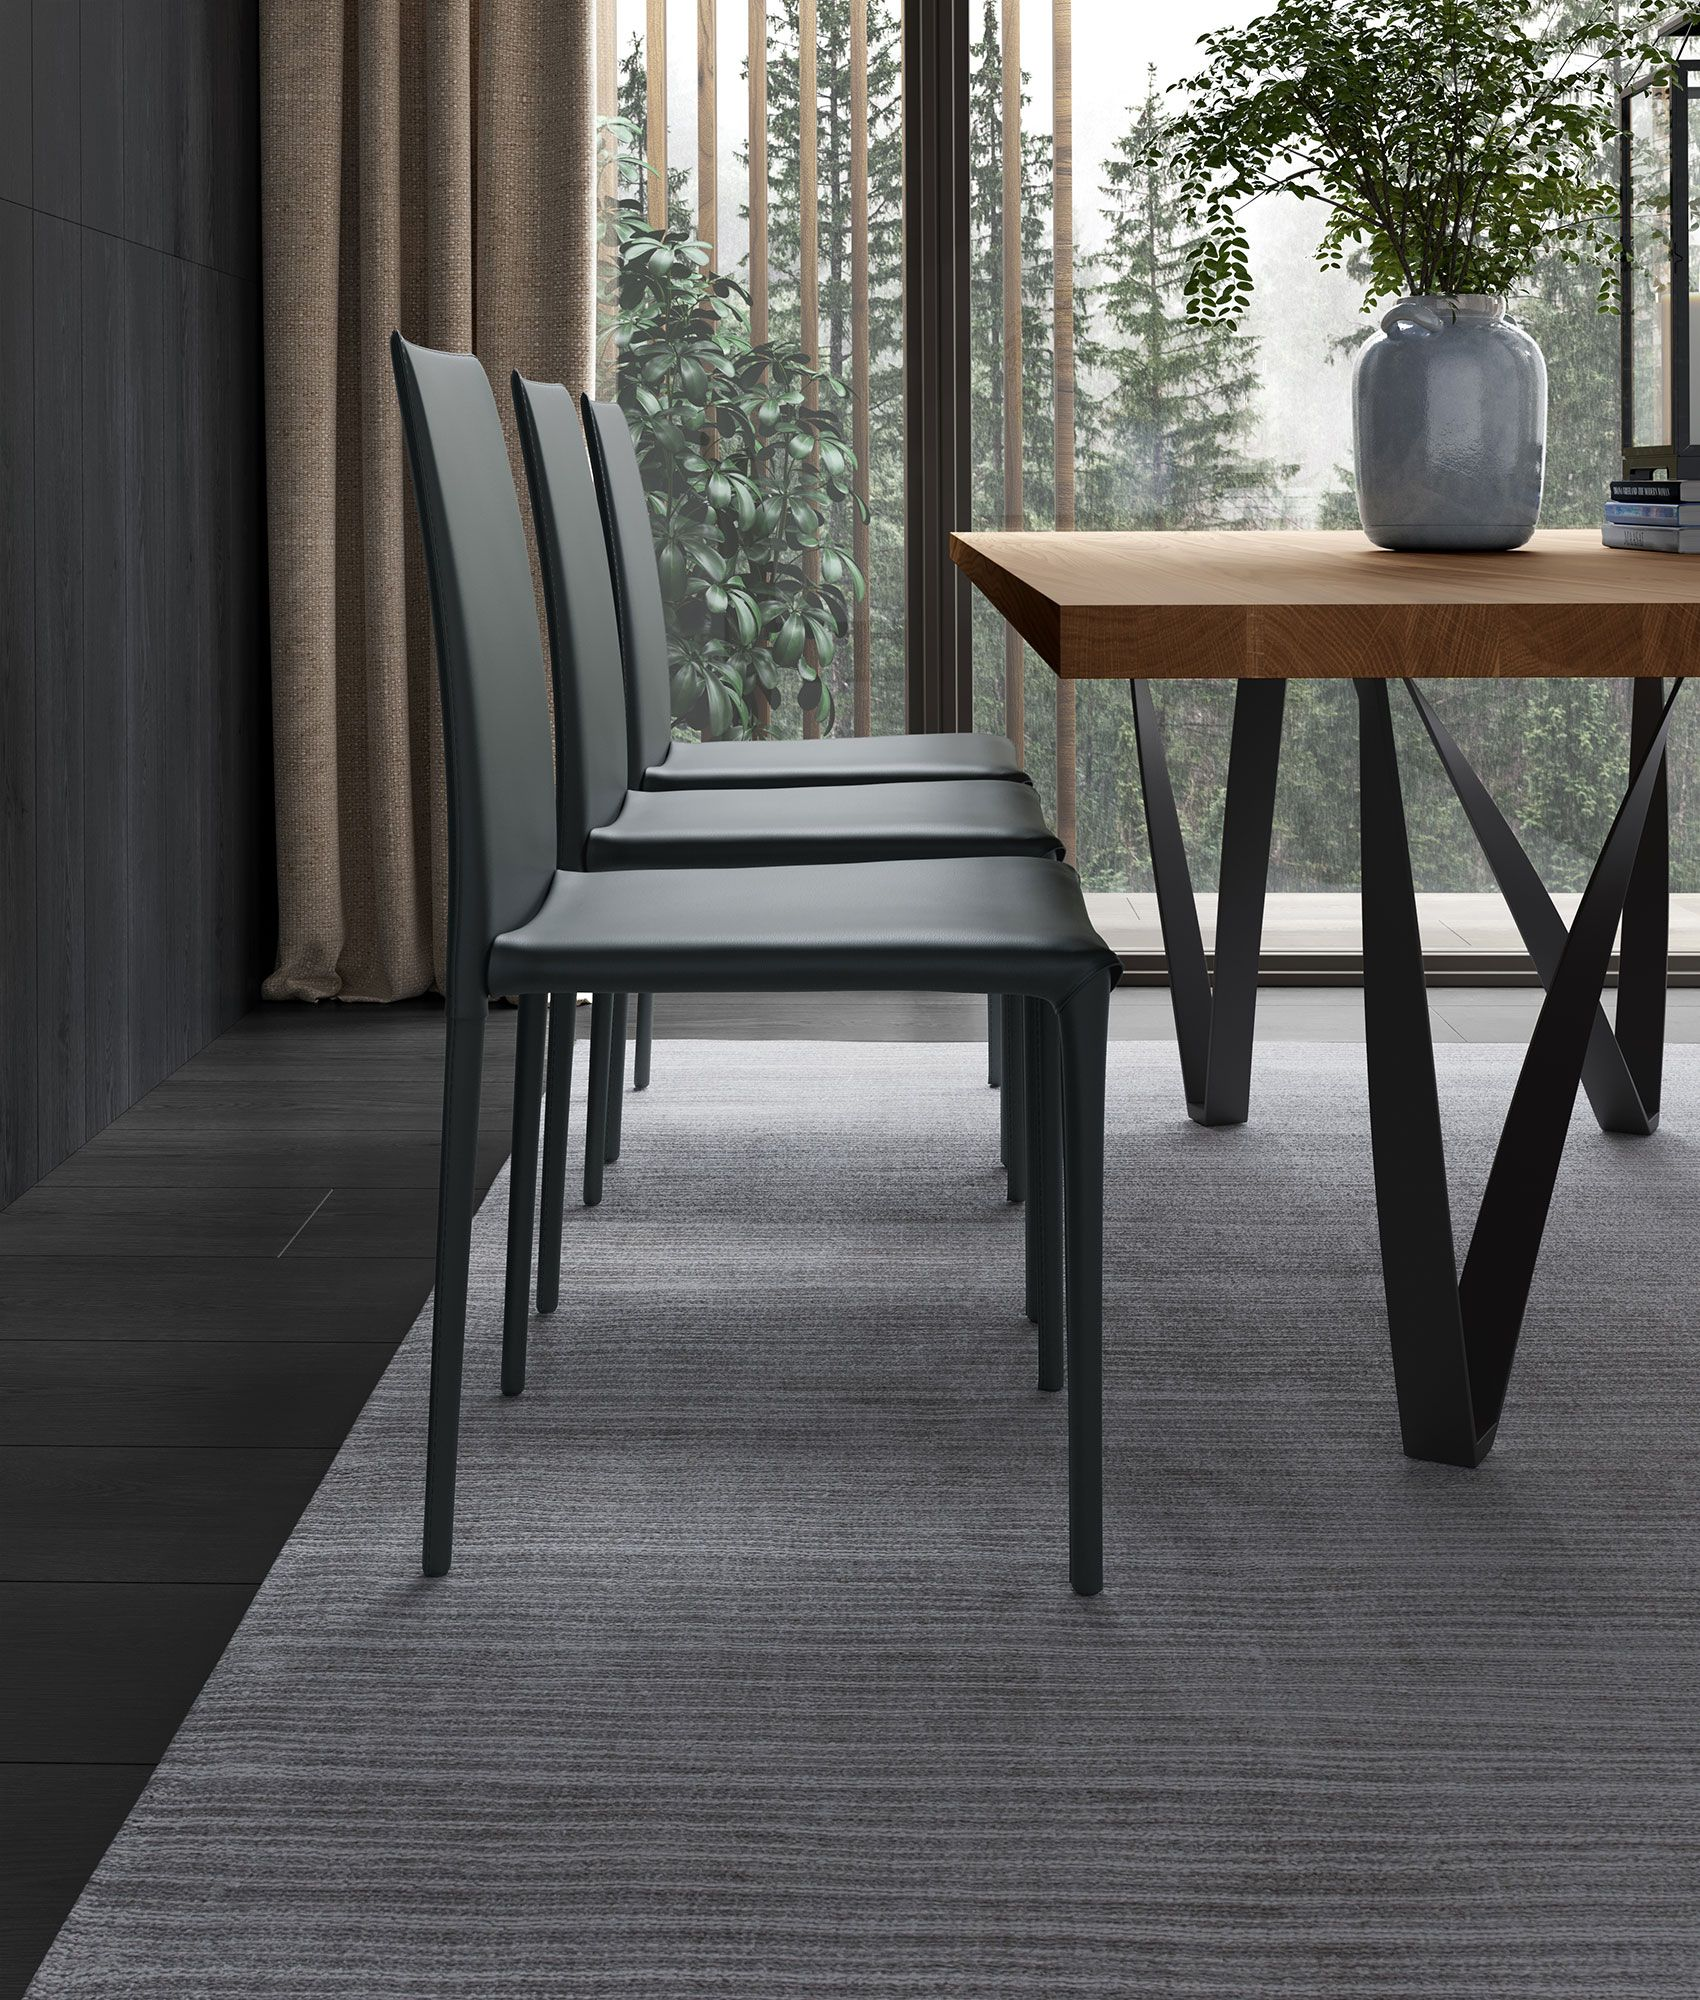 Modloft Varick Dining Chair MD605 Official Store | Dining ...